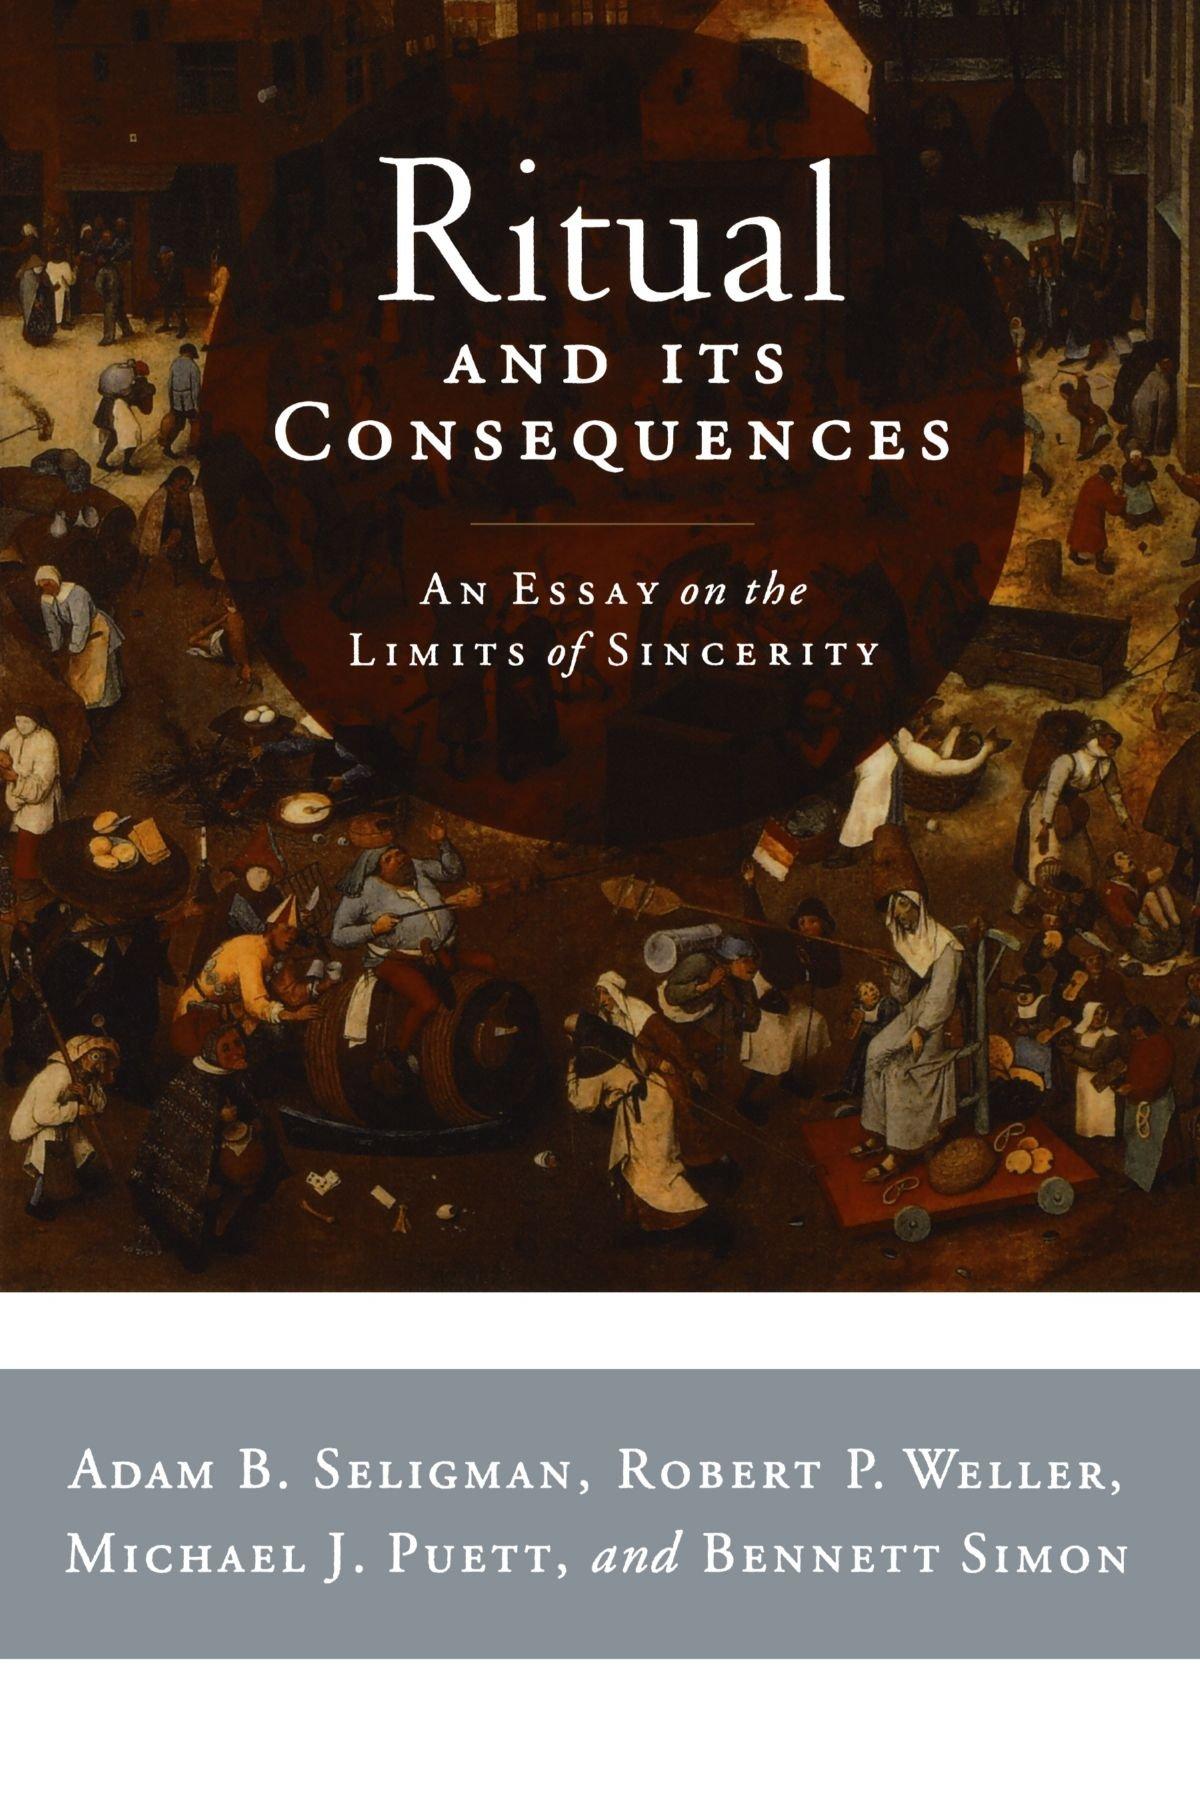 essays on sincerity